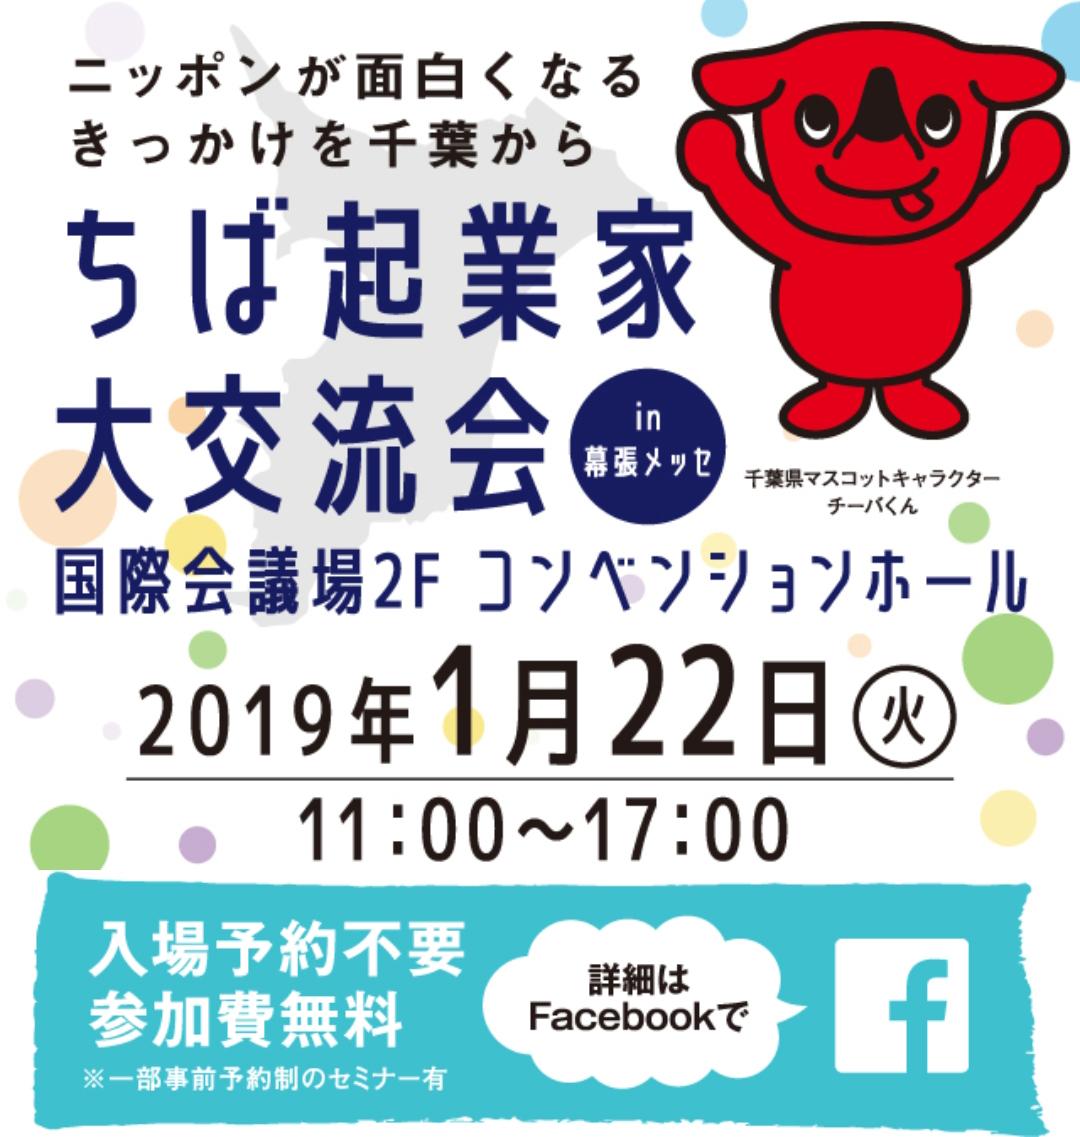 千葉起業家大交流会 in 幕張メッセ 1/22 11:00~